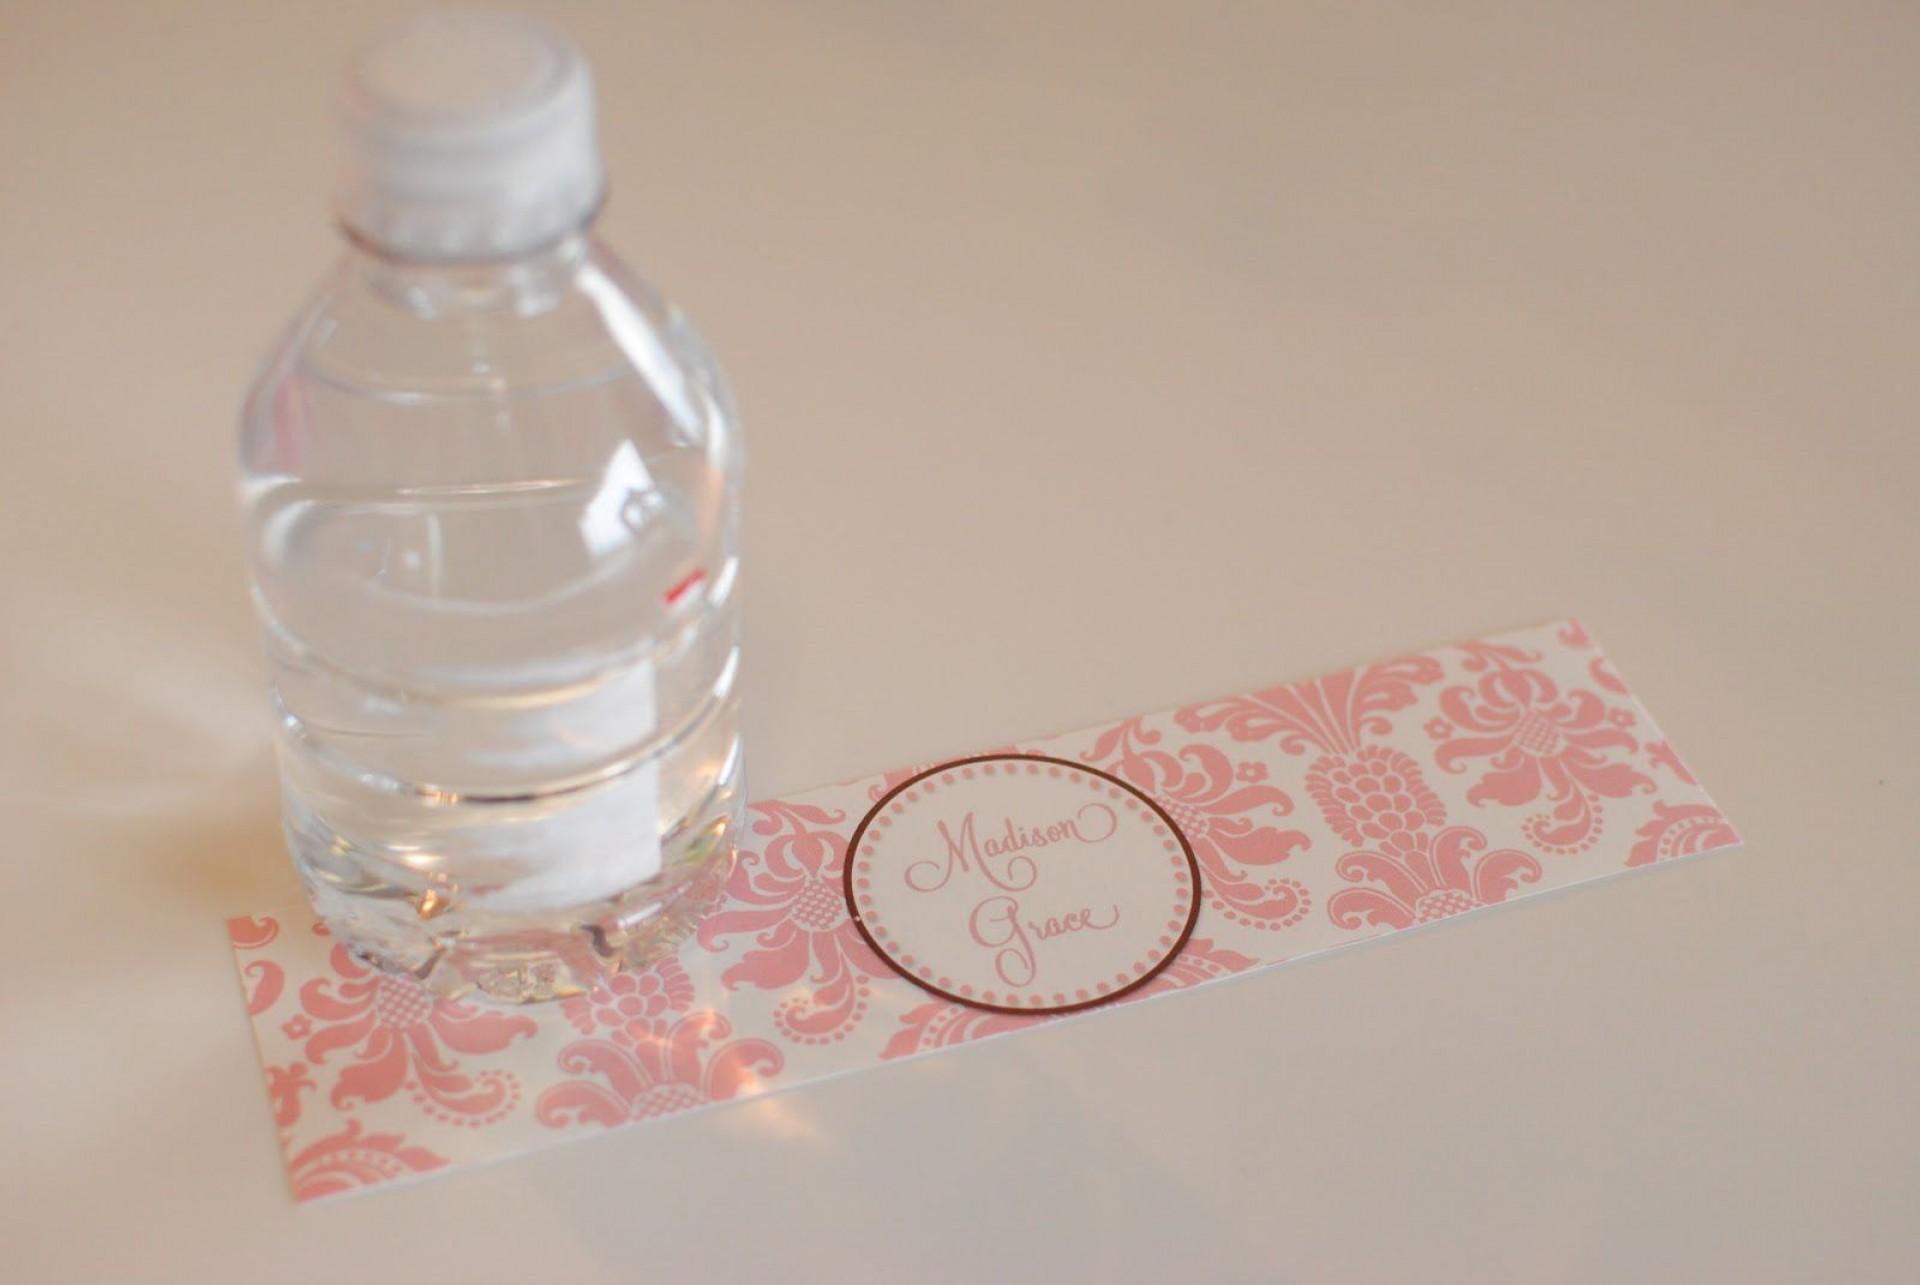 004 Breathtaking Diy Water Bottle Label Template Free High Def 1920